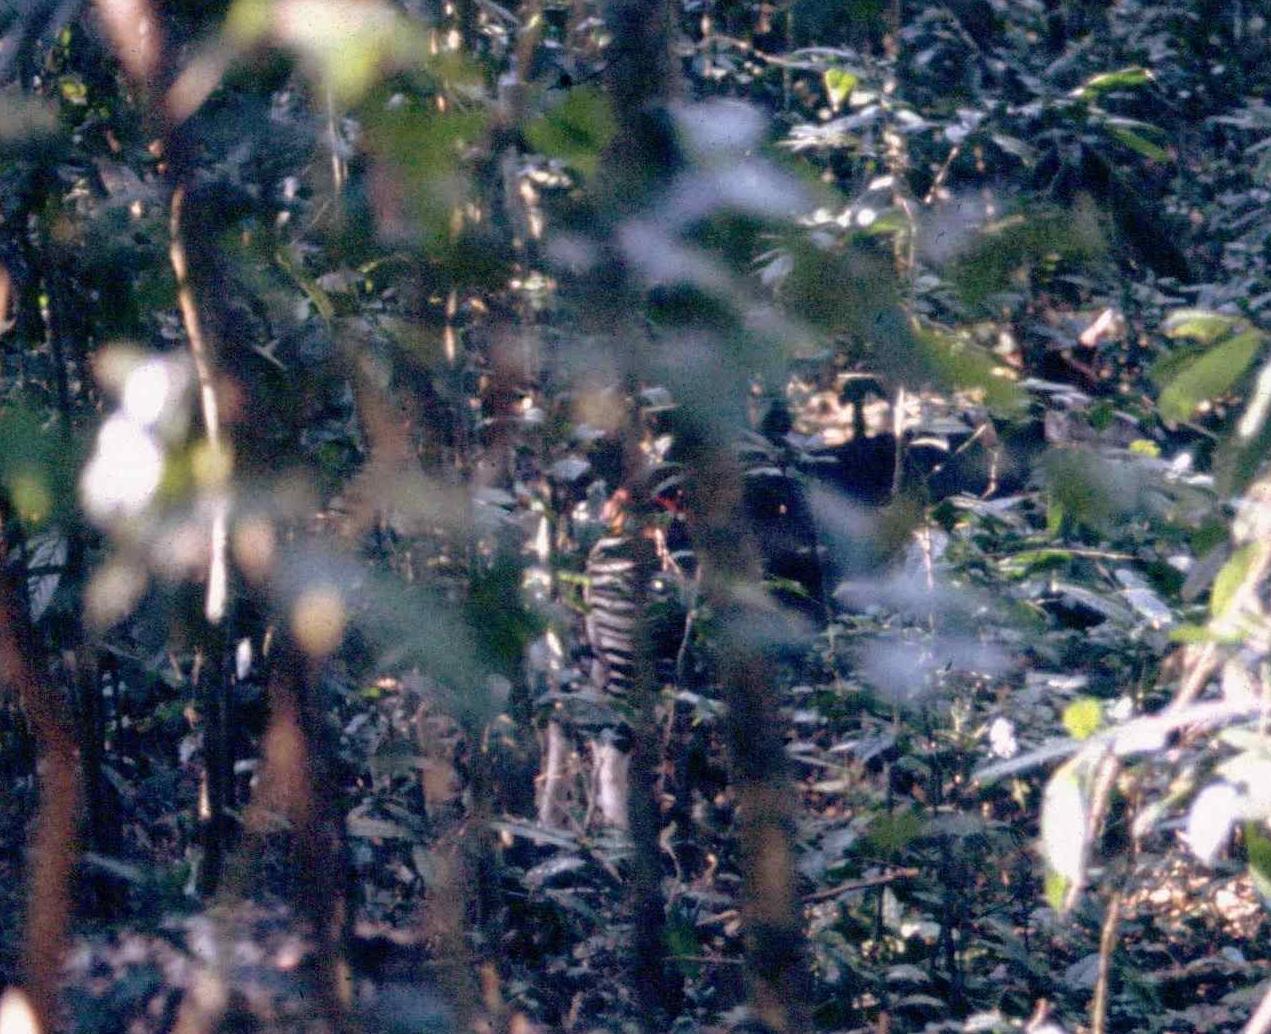 An okapi in a rainforest